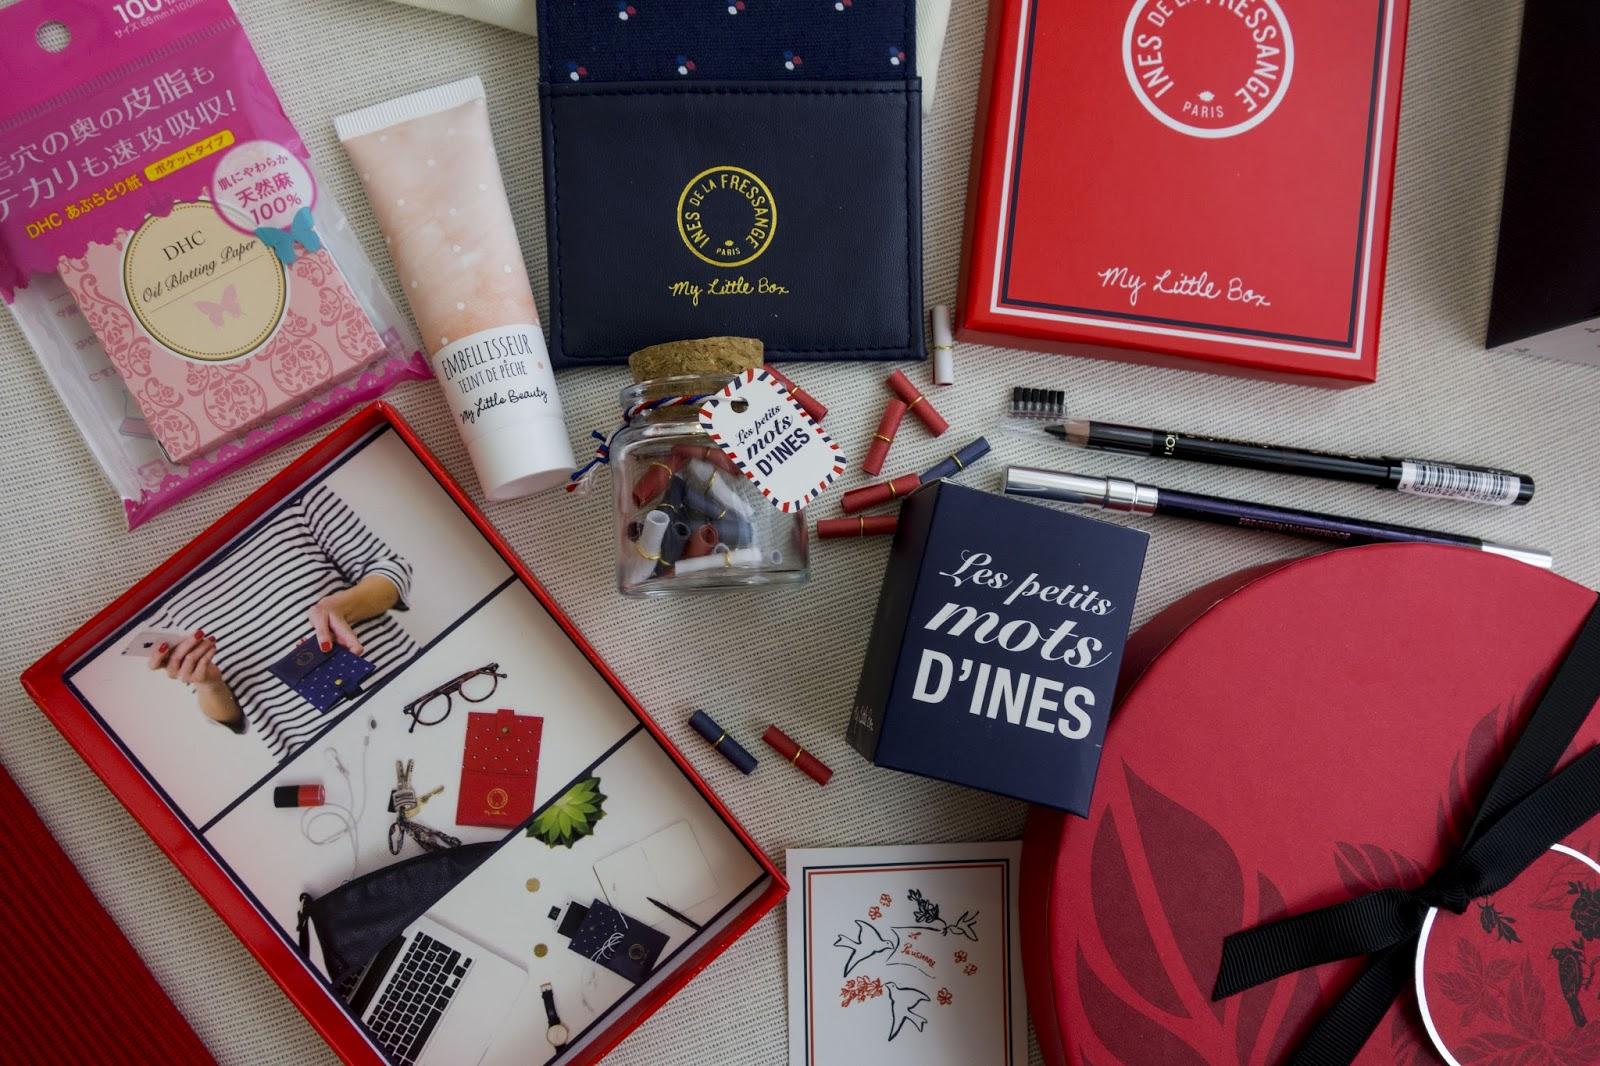 My Little Box Review February 15 Edition Frenchie Box Ines De La Fressange